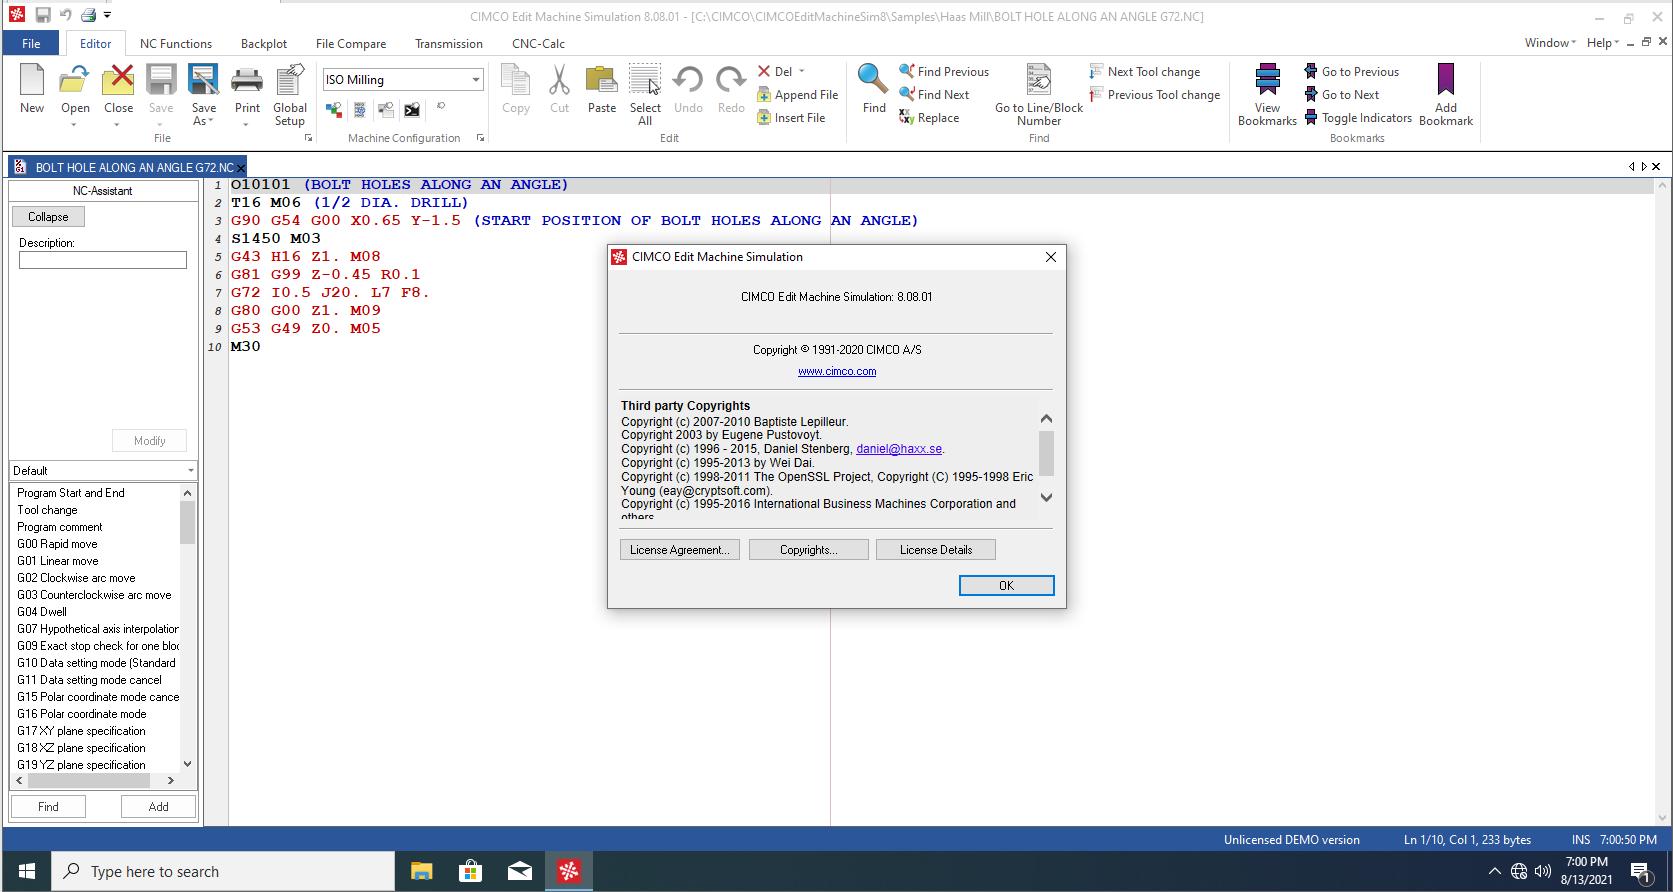 Working with CIMCO Machine Simulation 8.08.01 full